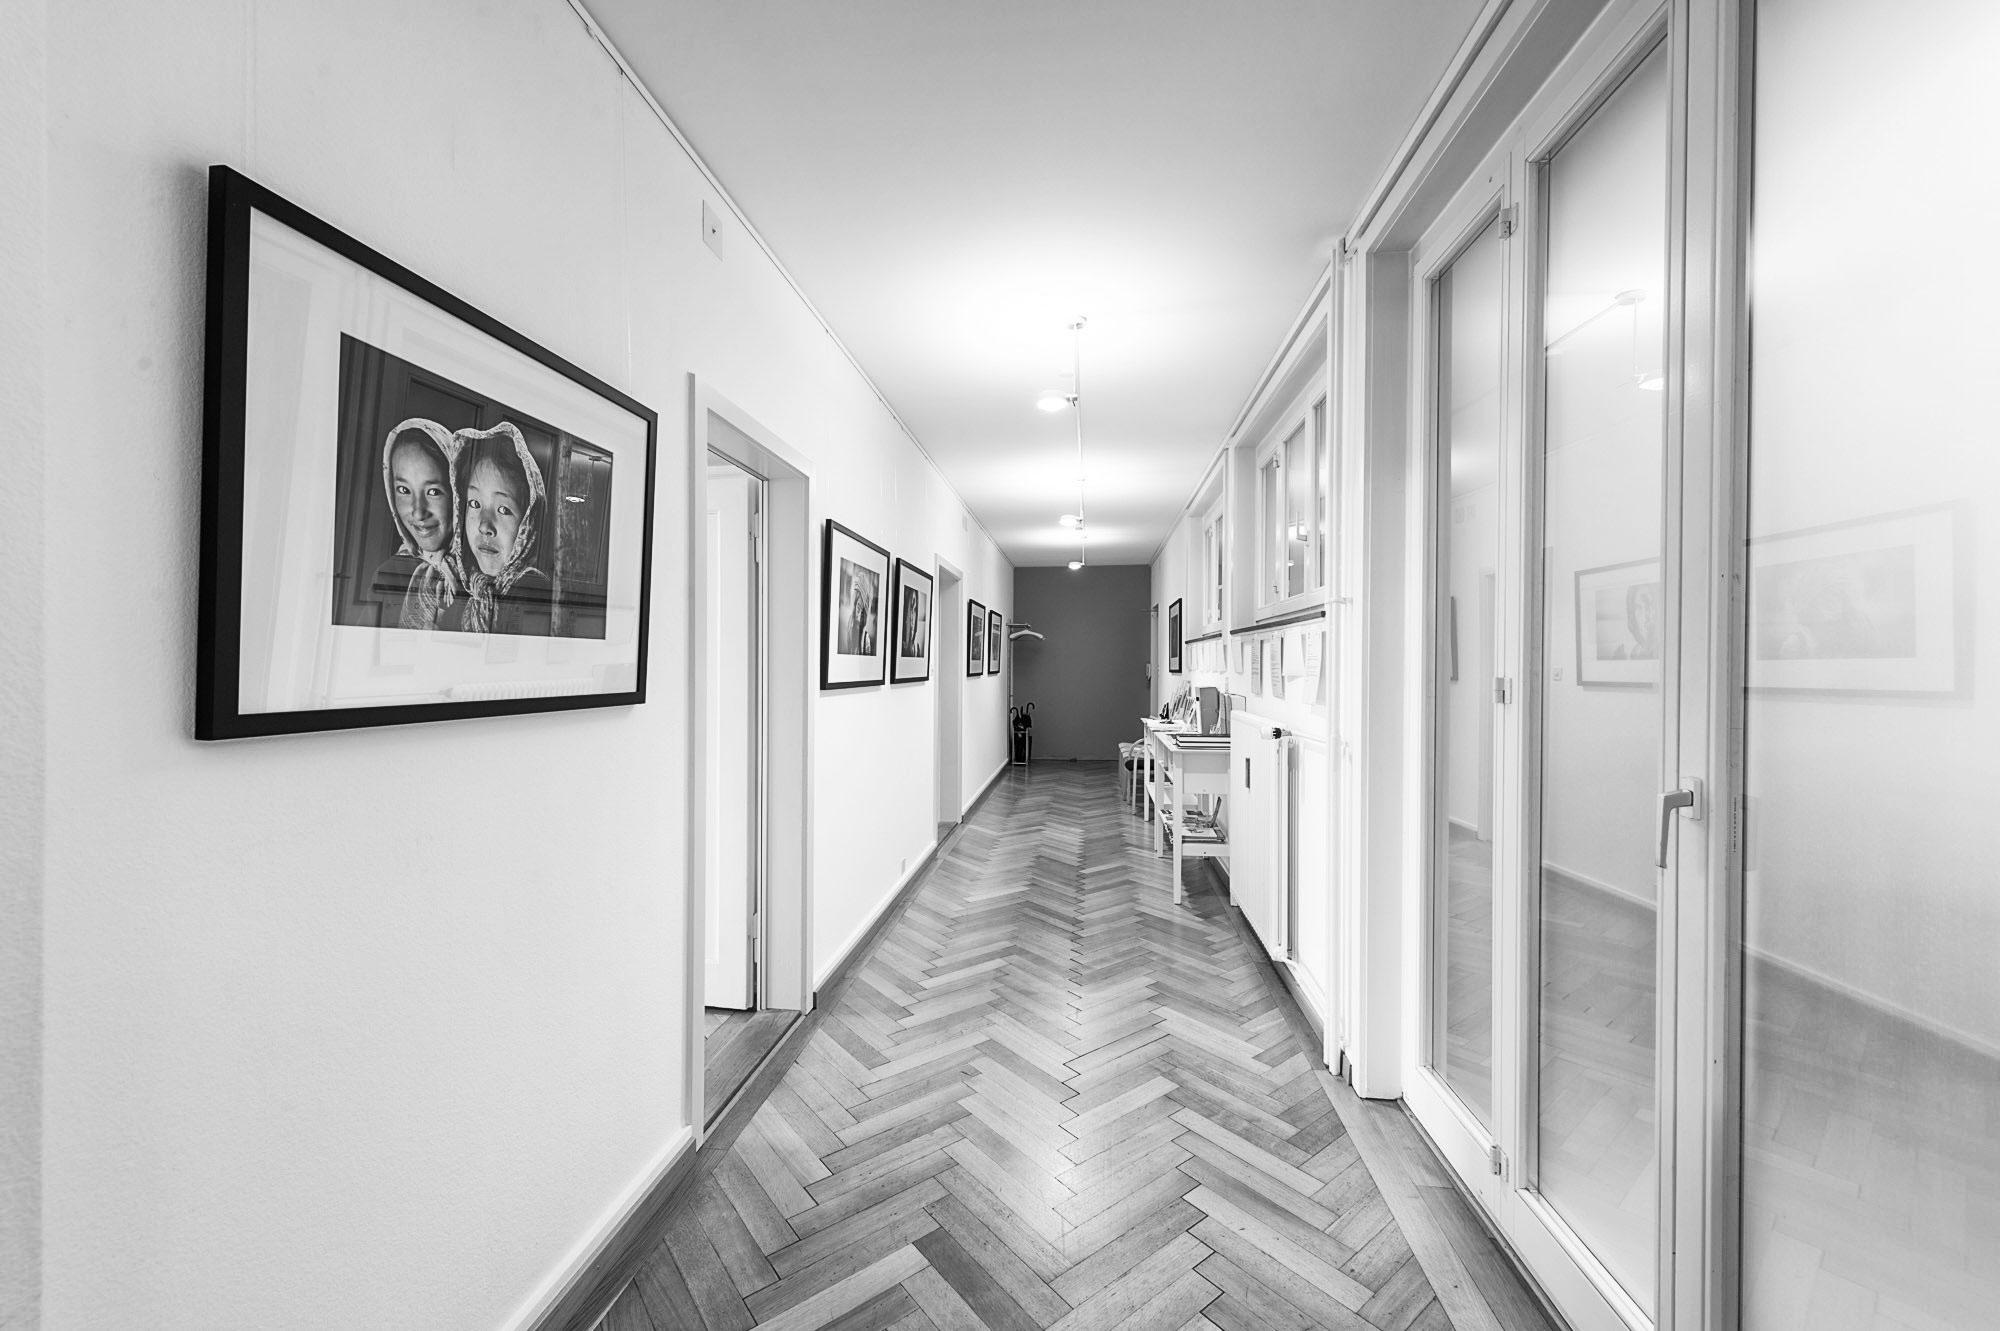 kunstgalerie akulu luzern 201 4